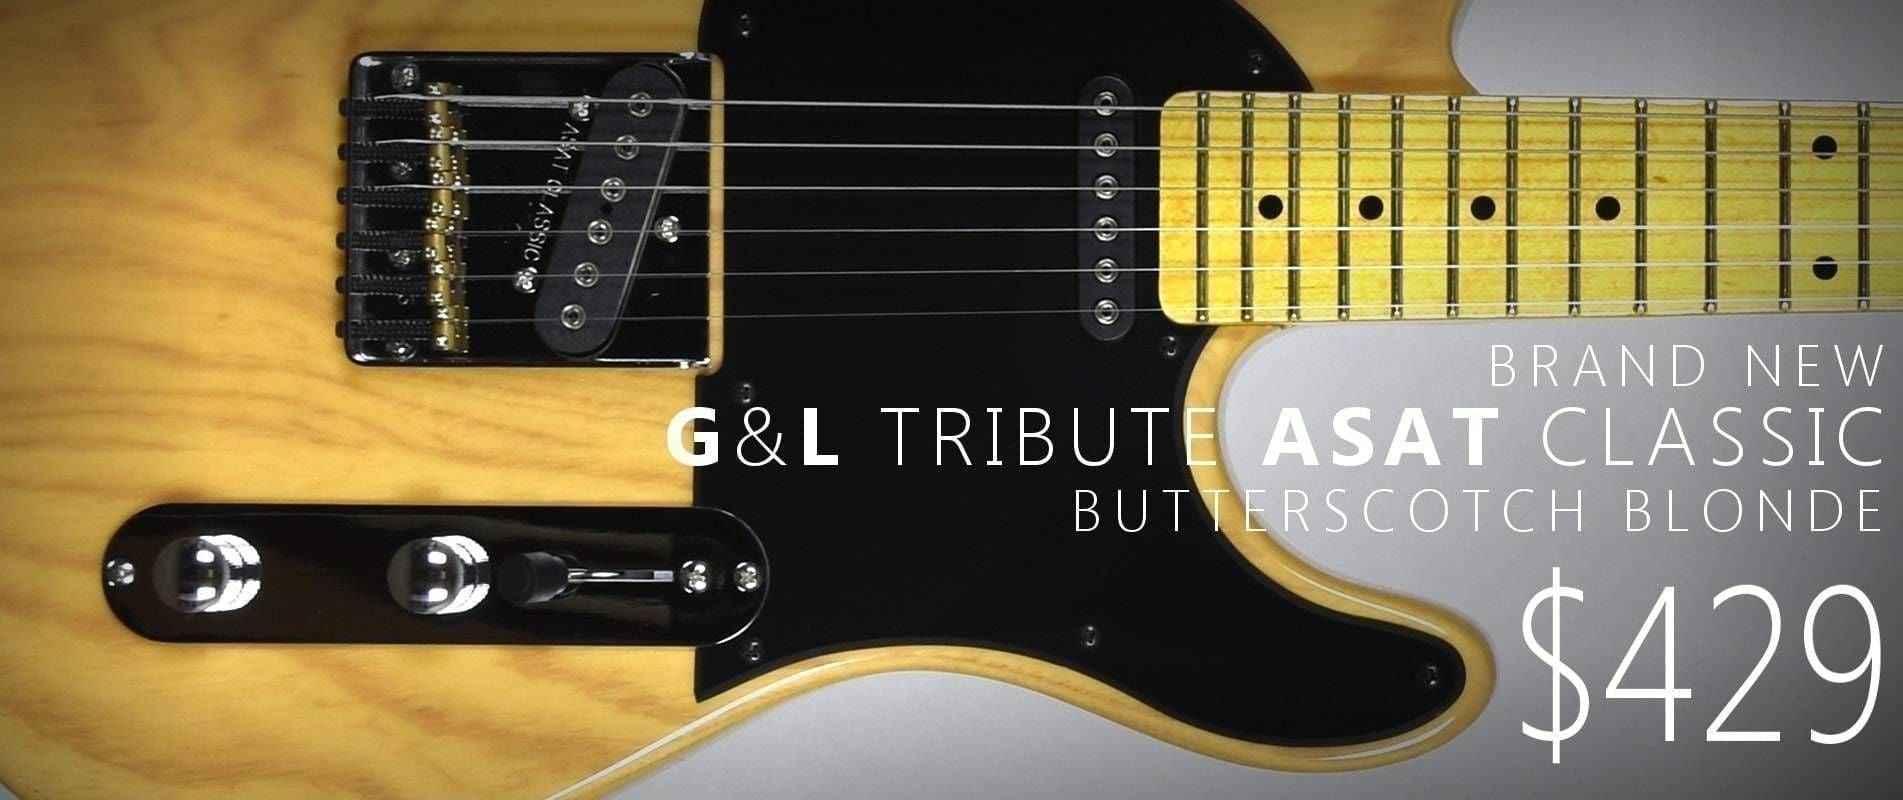 On Sale - G&L Tribute ASAT Classic Butterscotch Blonde